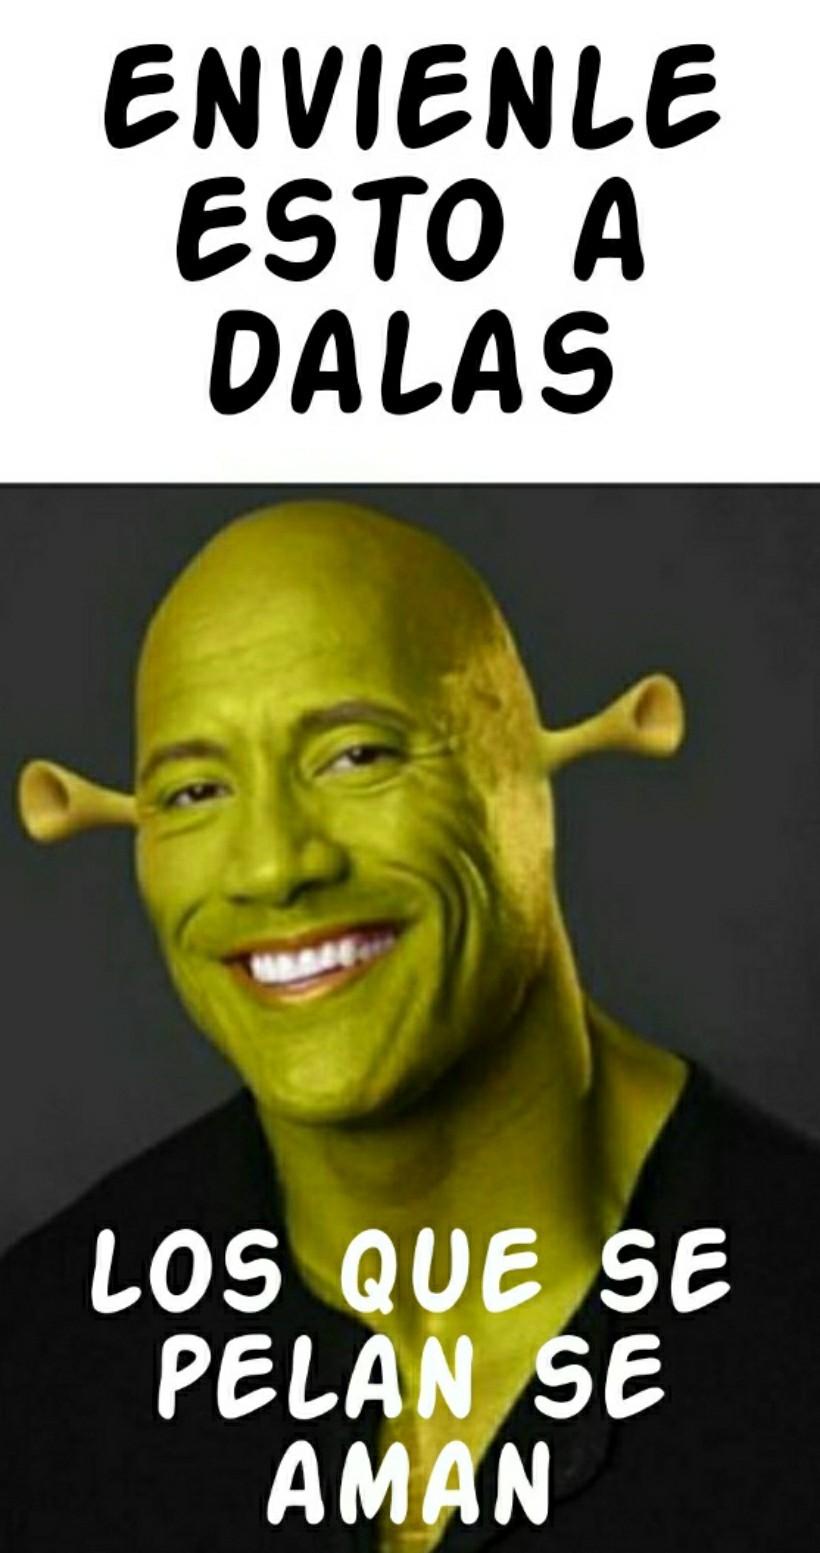 Haganlo - meme